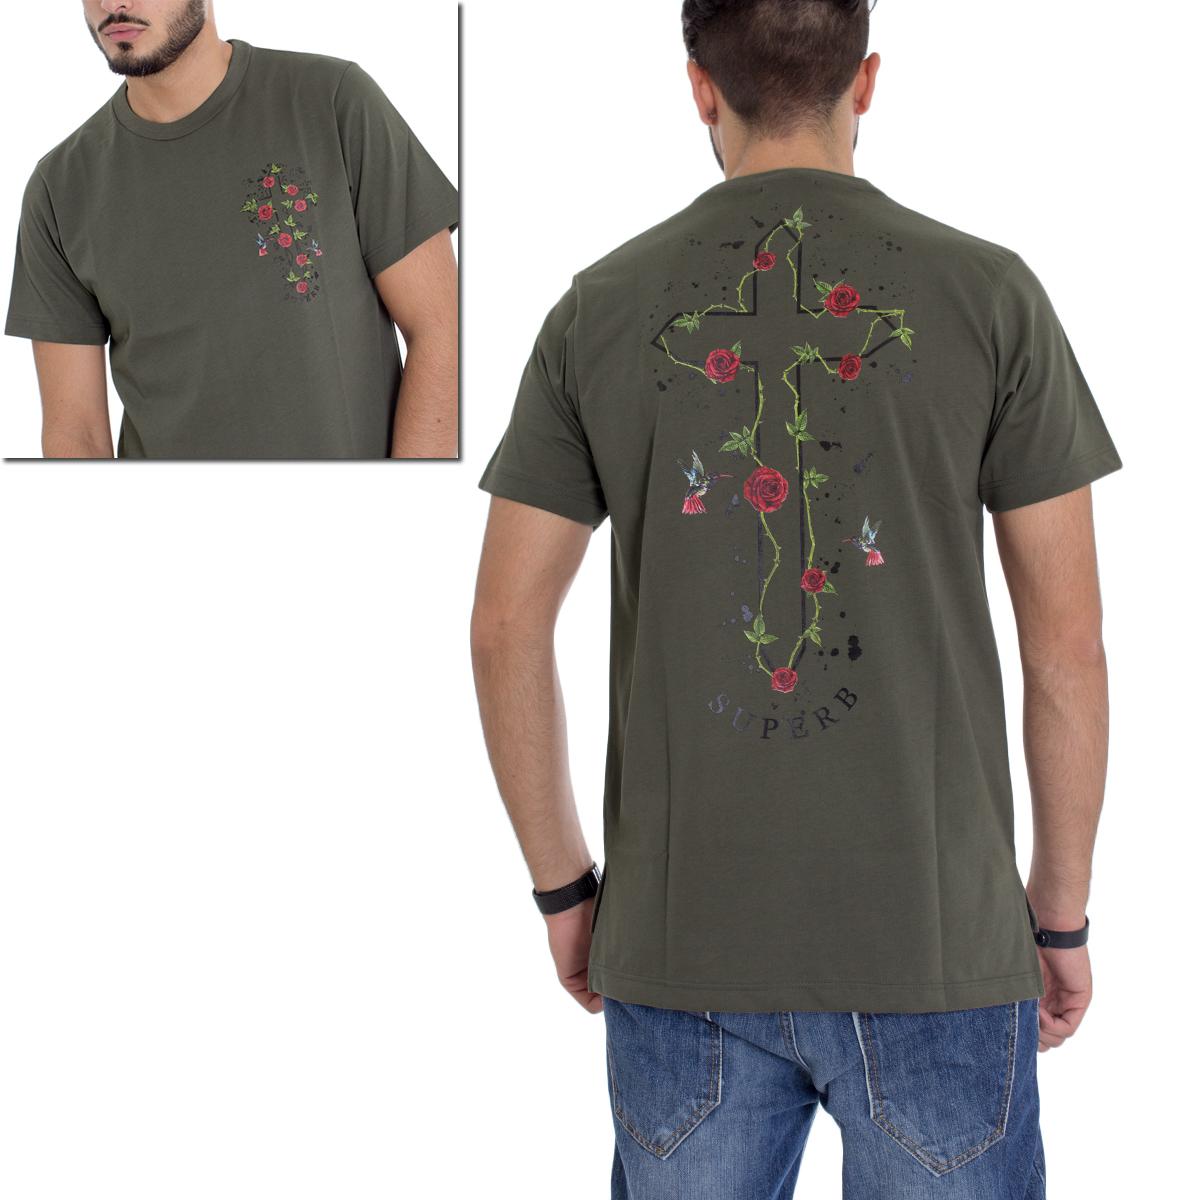 T-Shirt-Uomo-MOD-Cotone-Stampa-Rosa-Scritte-Verde-Militare-GIOSAL miniatura 5